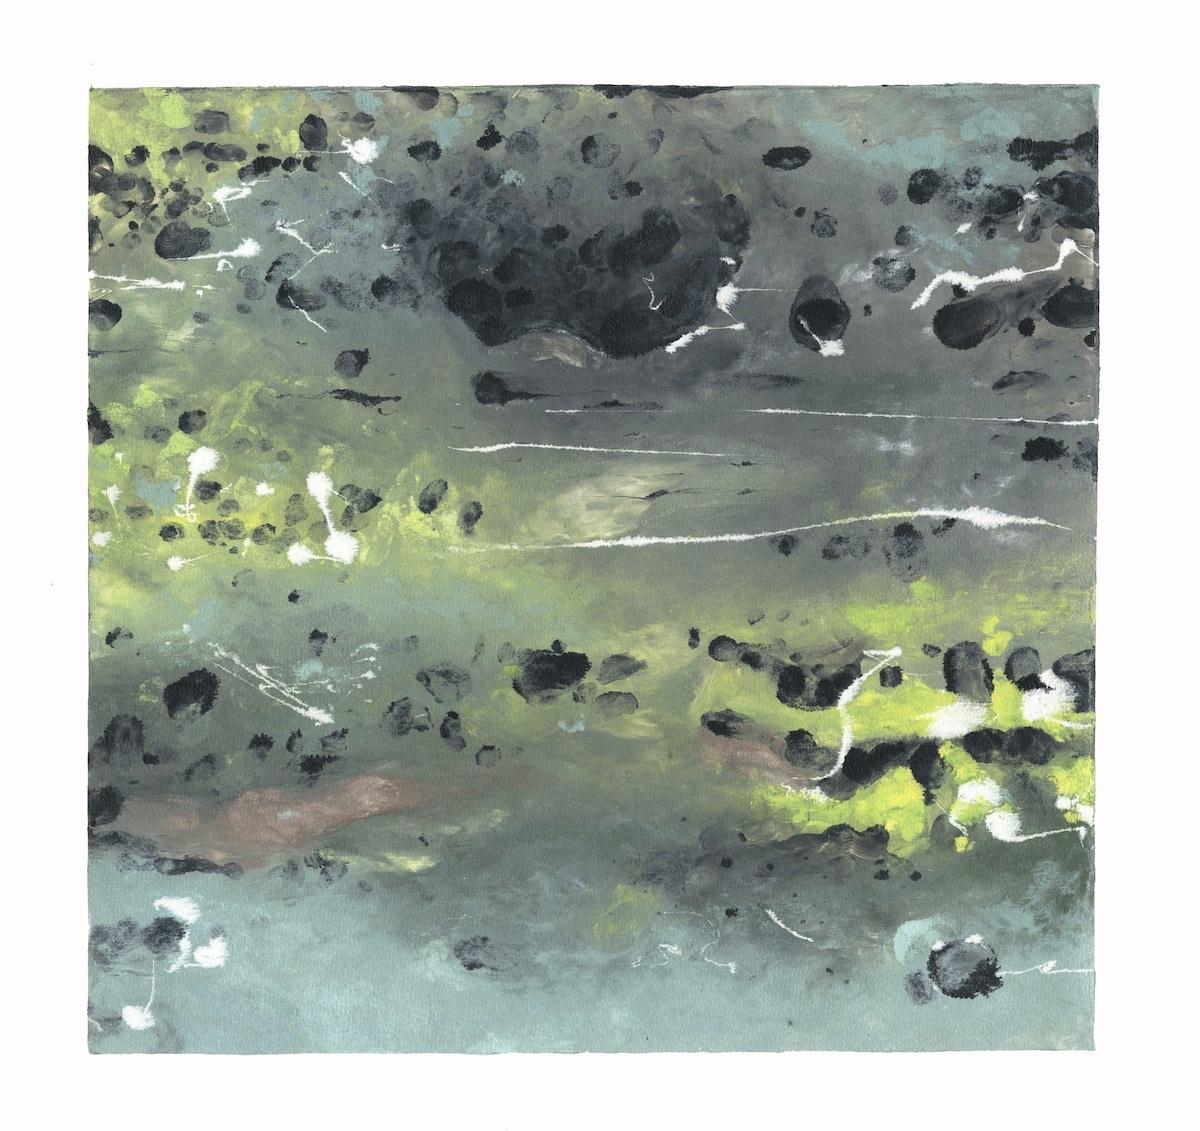 iva sedlackova's Work Image 4